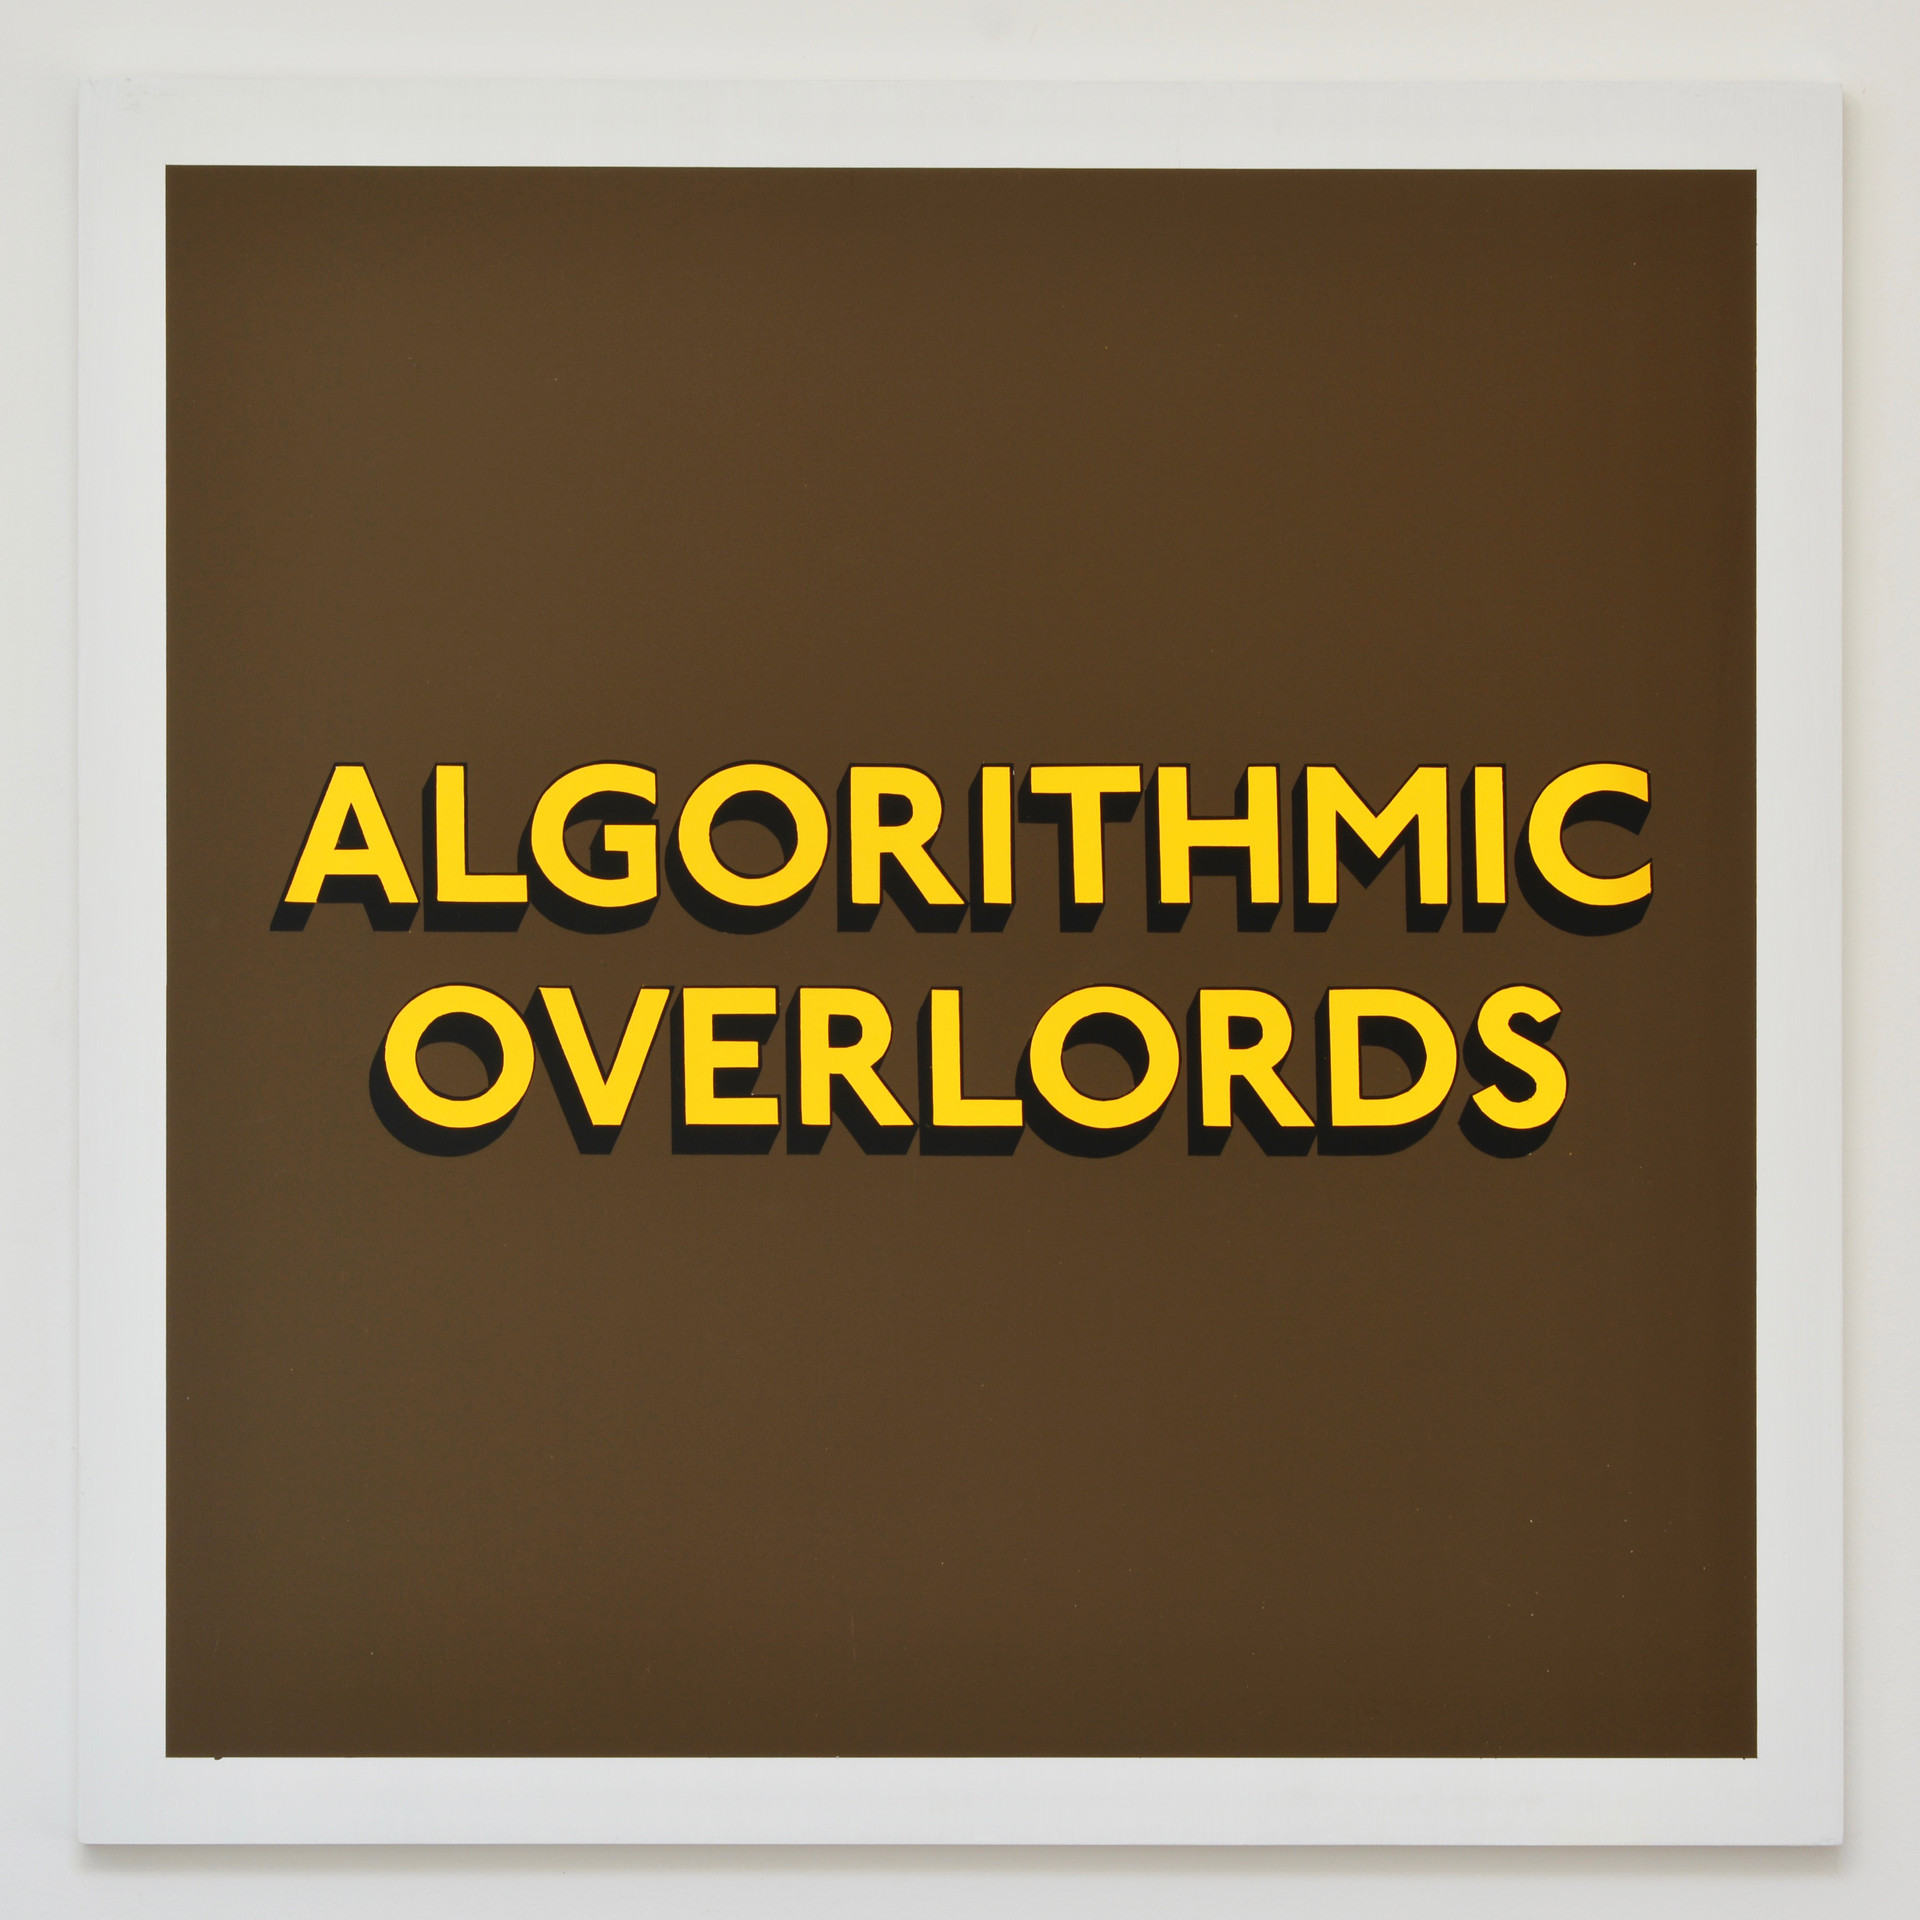 ALGORITHMIC_OVERLORDS.jpg